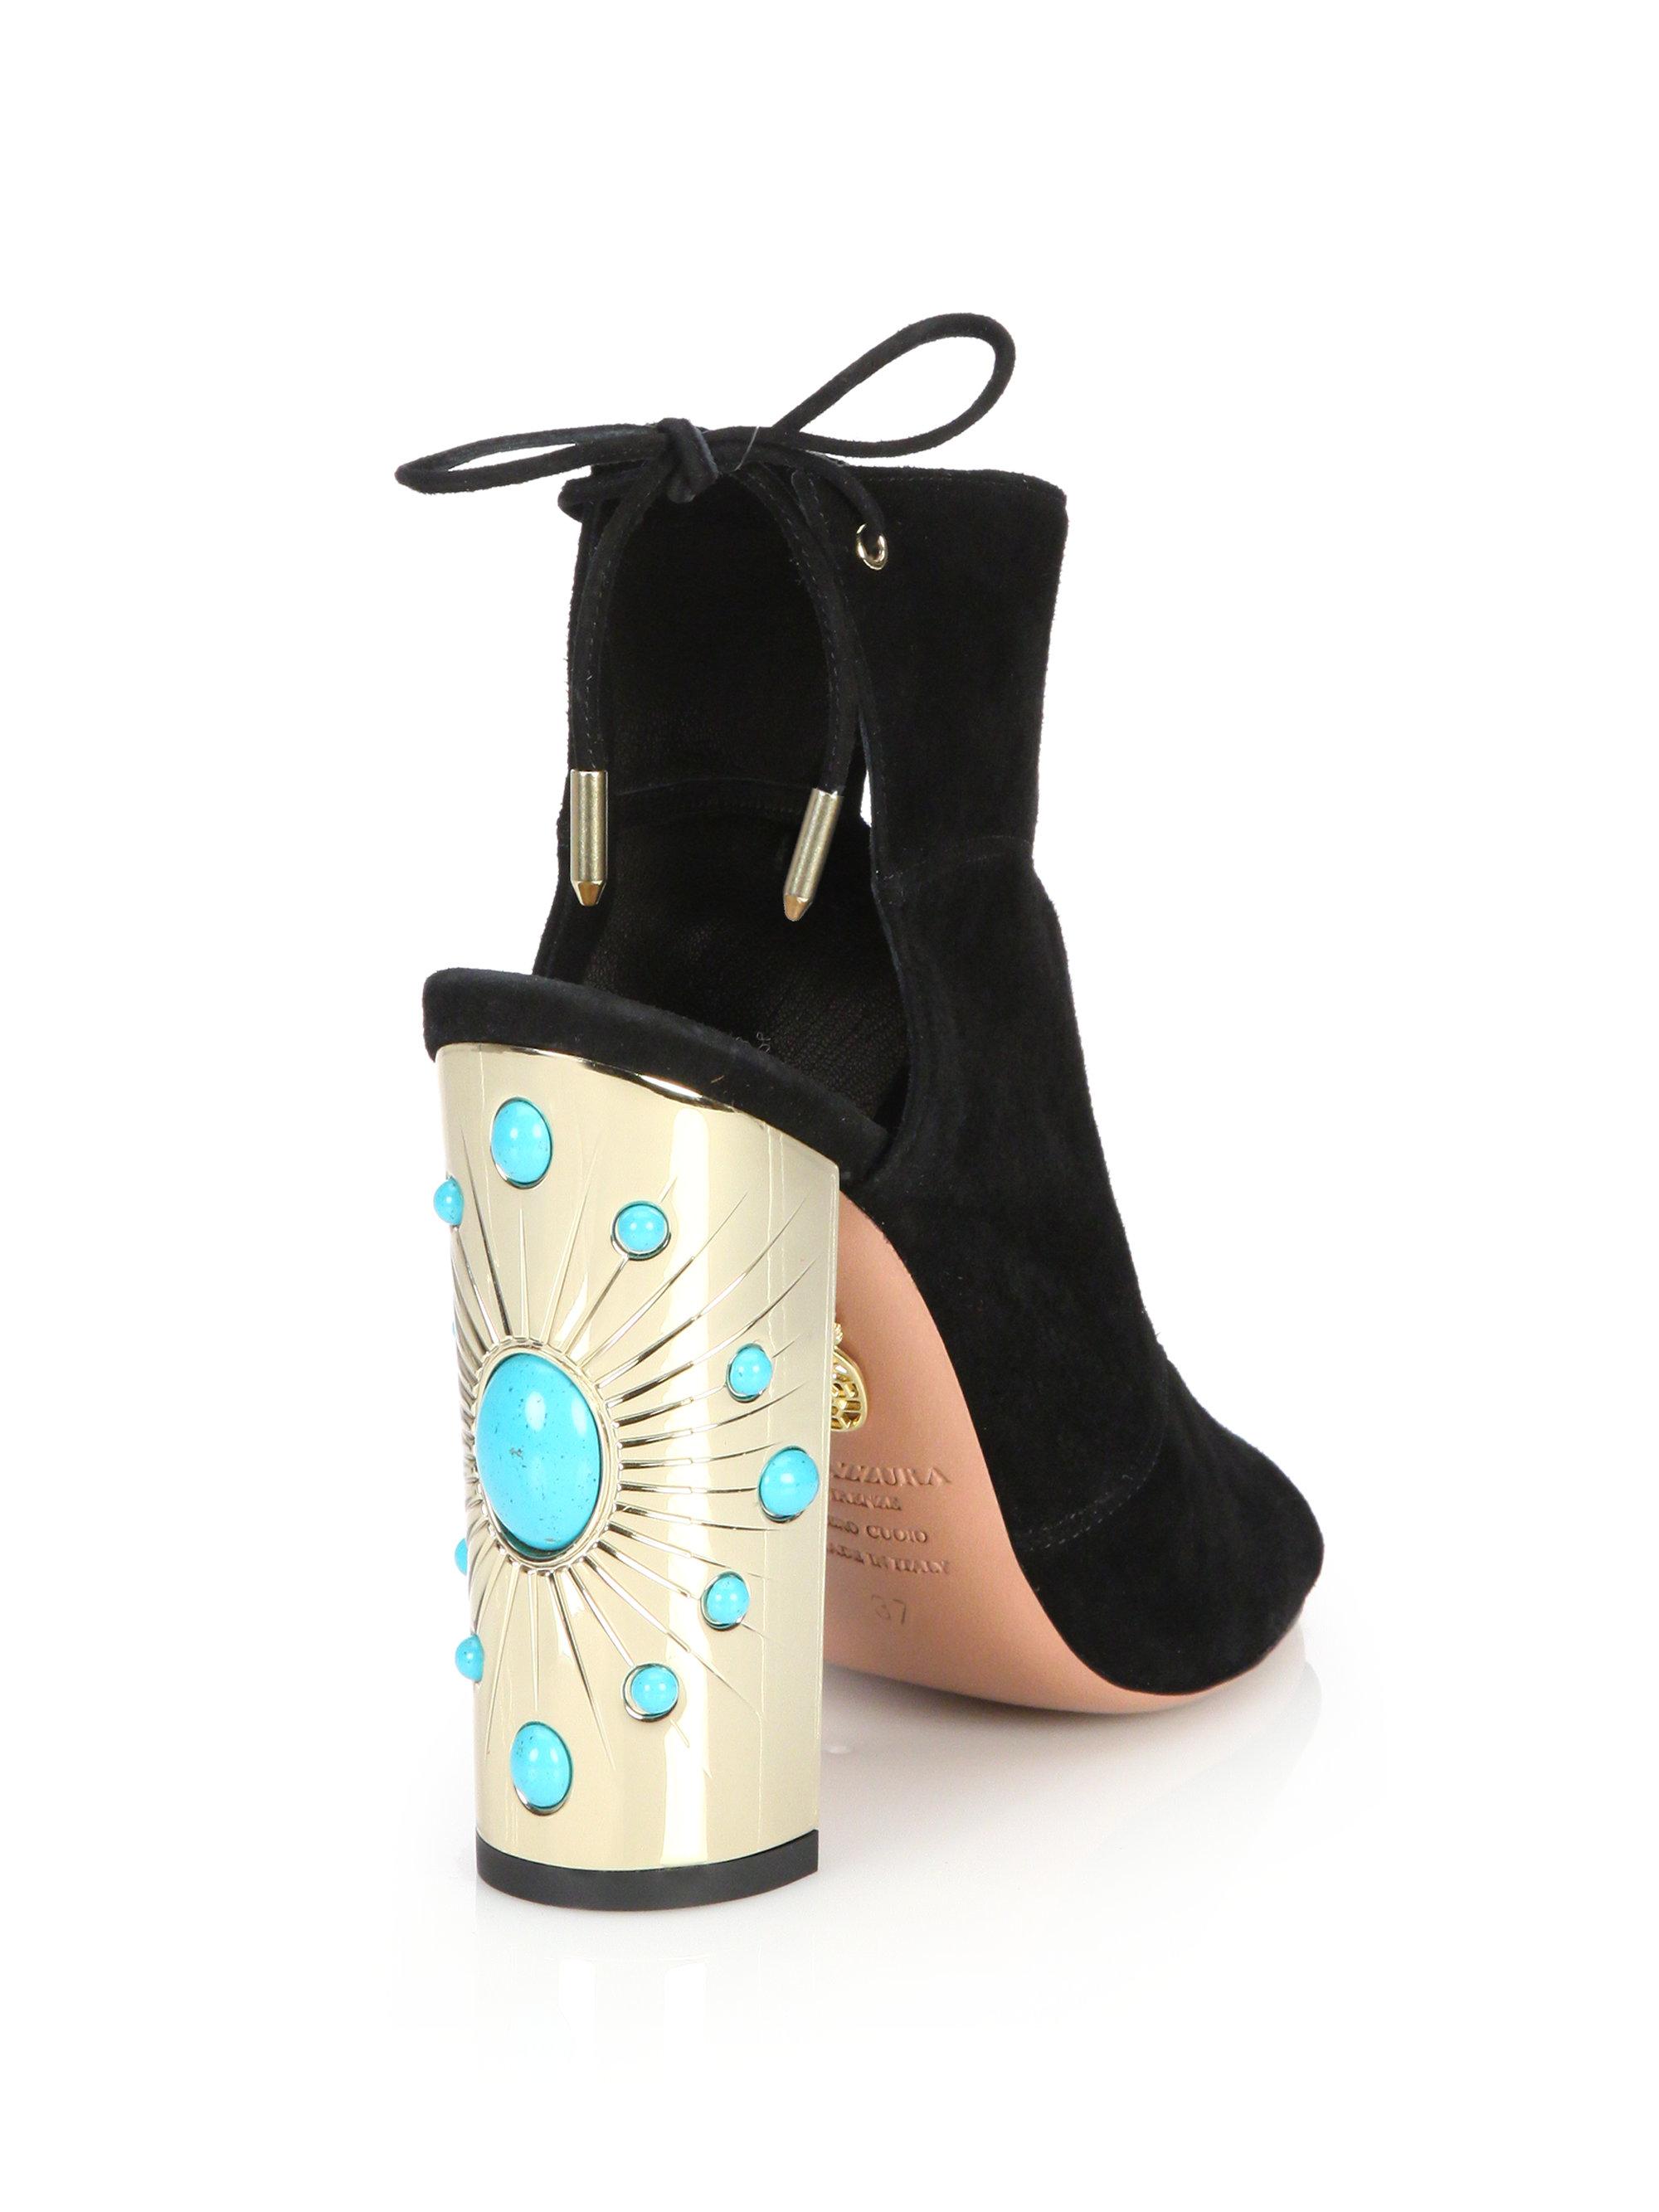 7fbe5194820 Lyst - Aquazzura Pasadena Sandals in Black